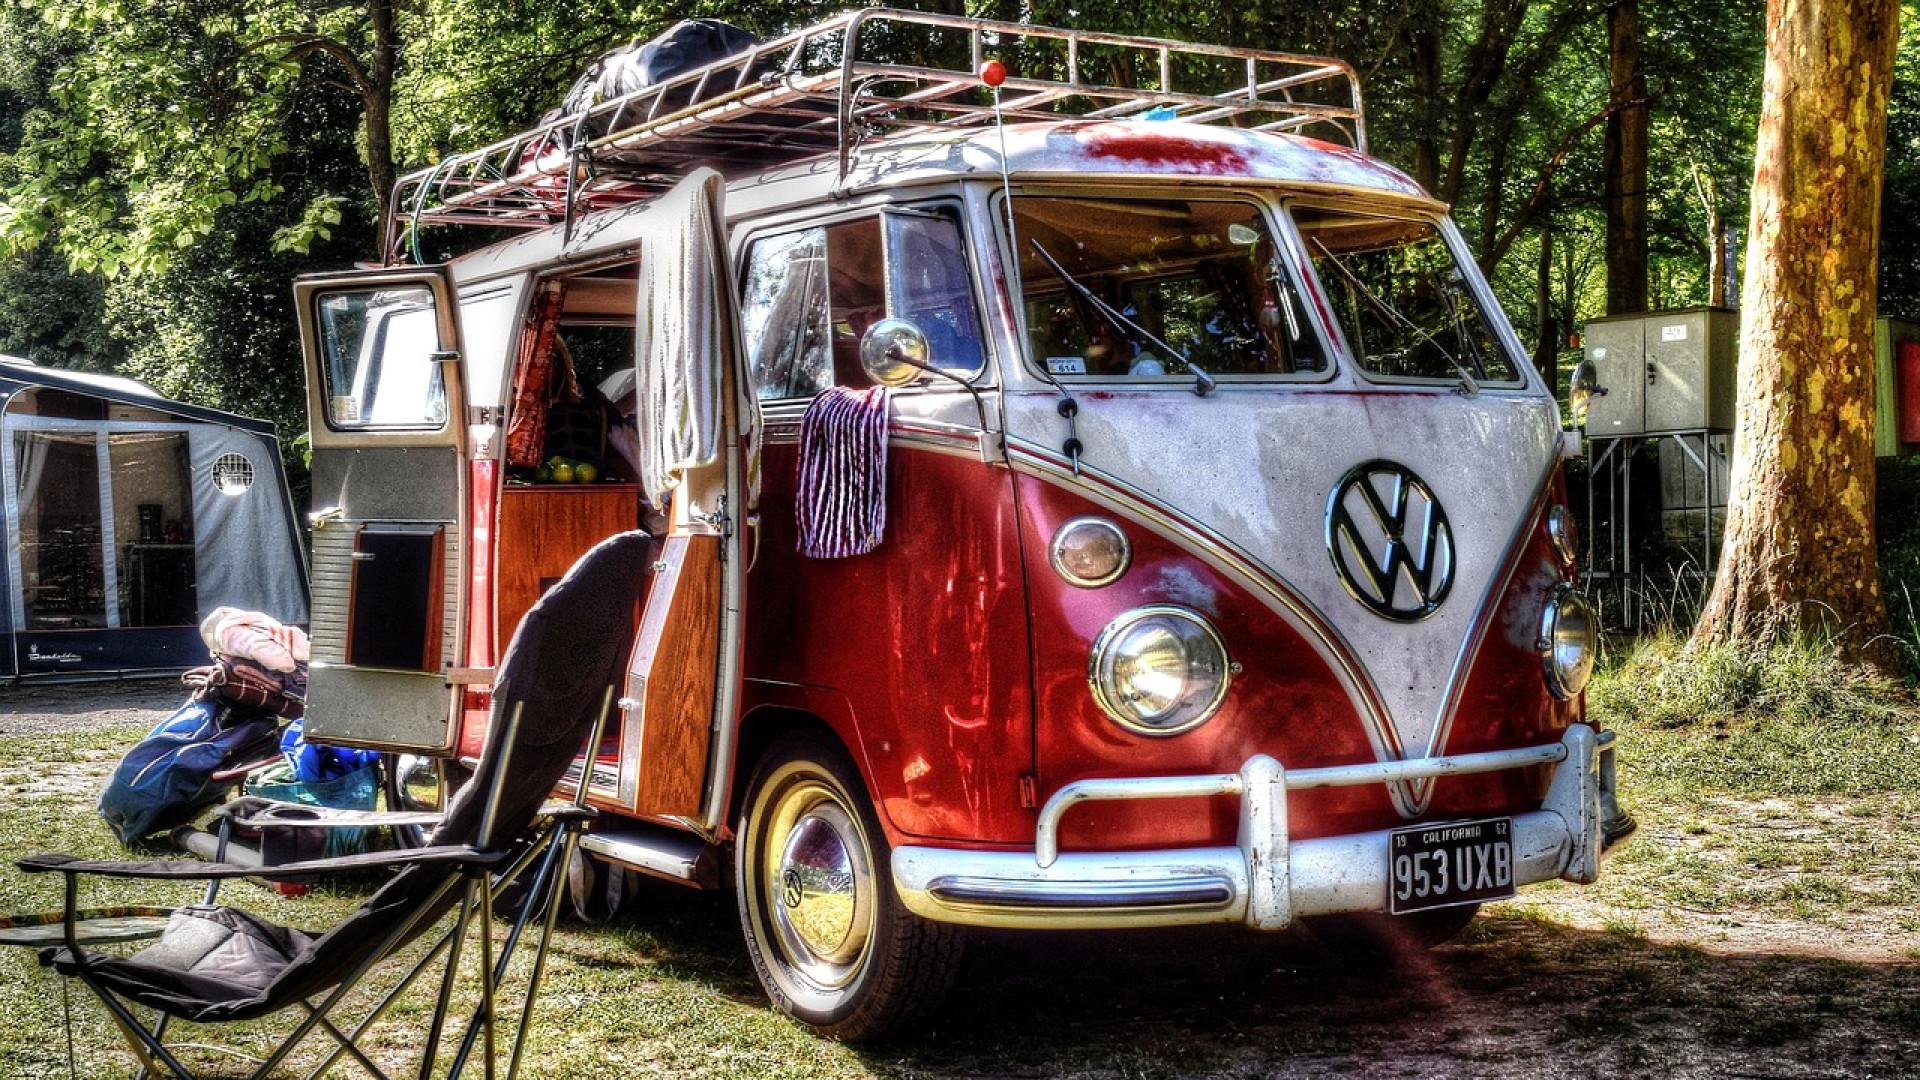 Comment organiser son voyage en camping-car